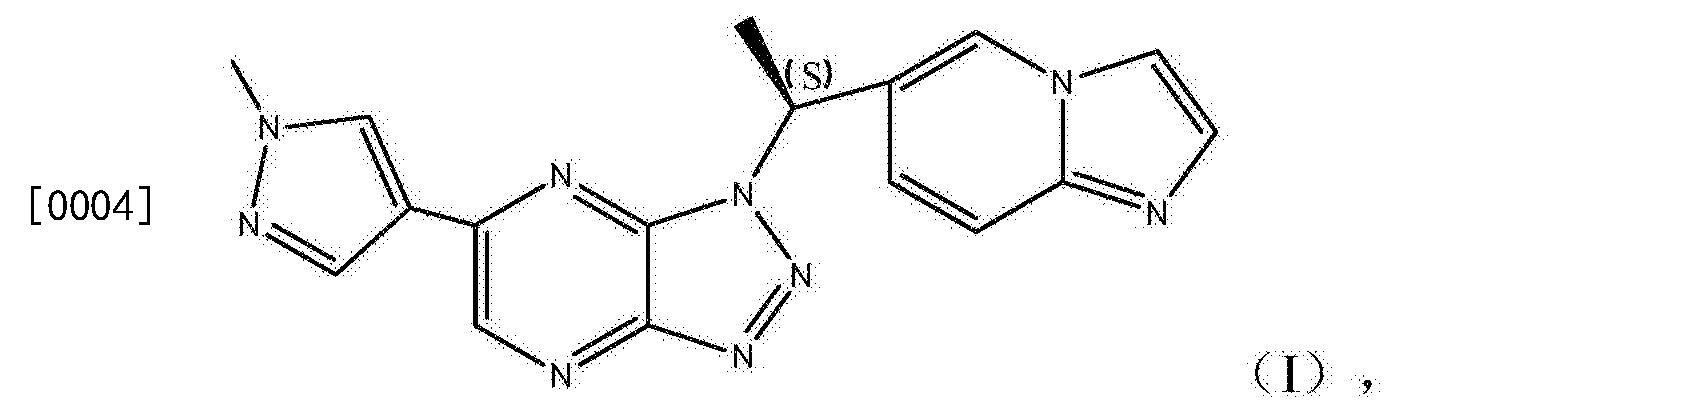 Figure CN105503905AD00031